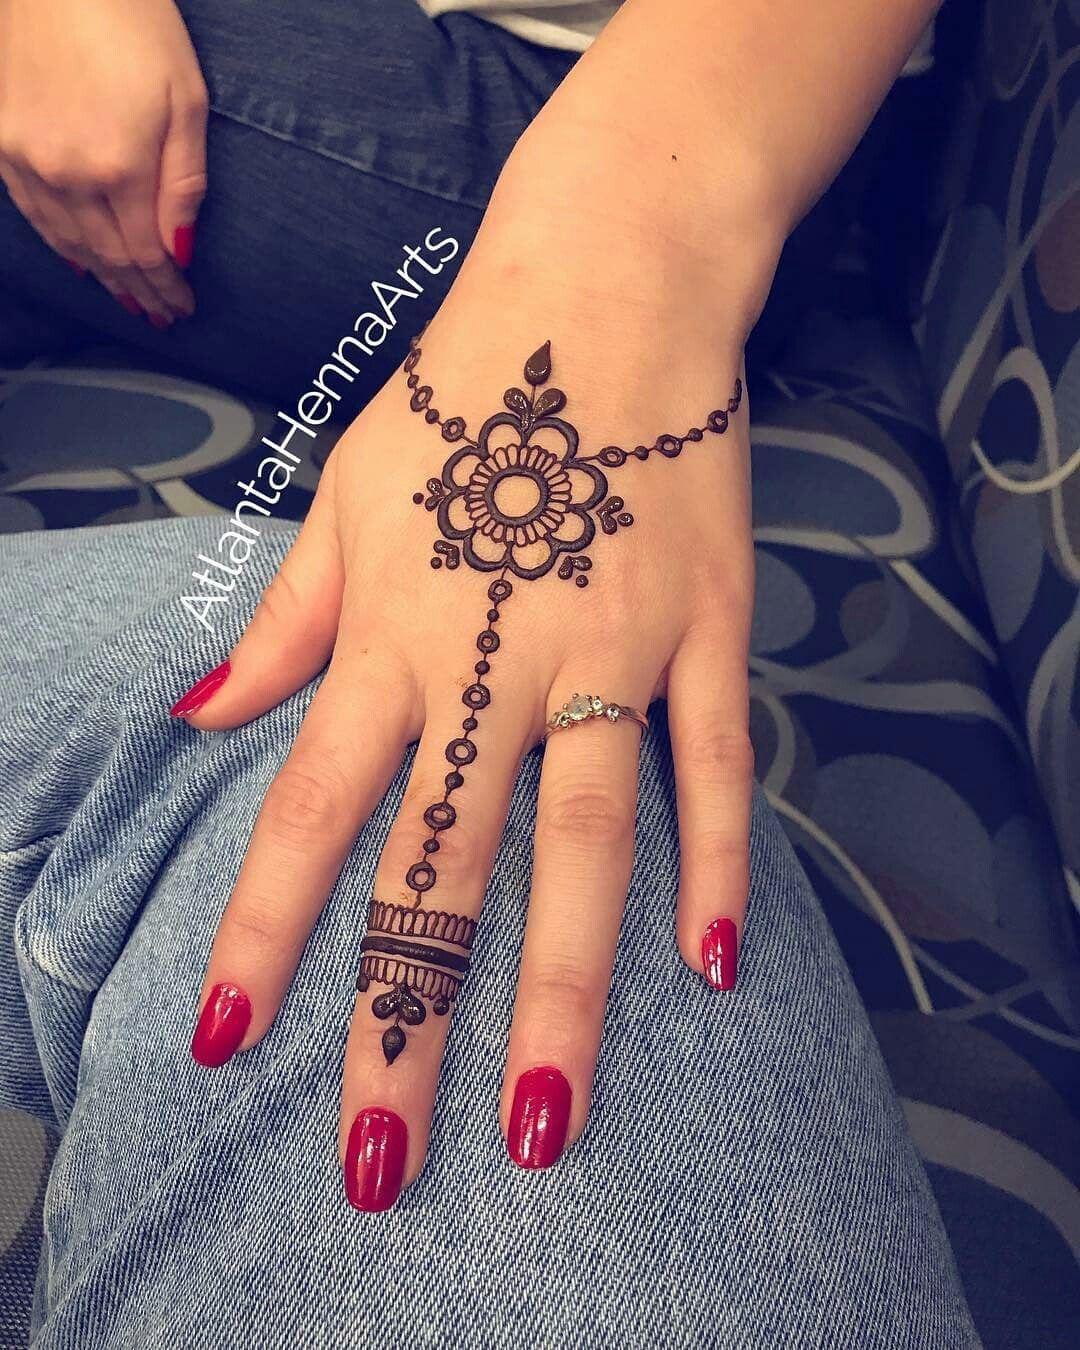 This Is So Cute By Atlantahennaarts Henna Mehndi Simple Henna Tattoo Henna Tattoo Designs Simple Henna Tattoo Hand